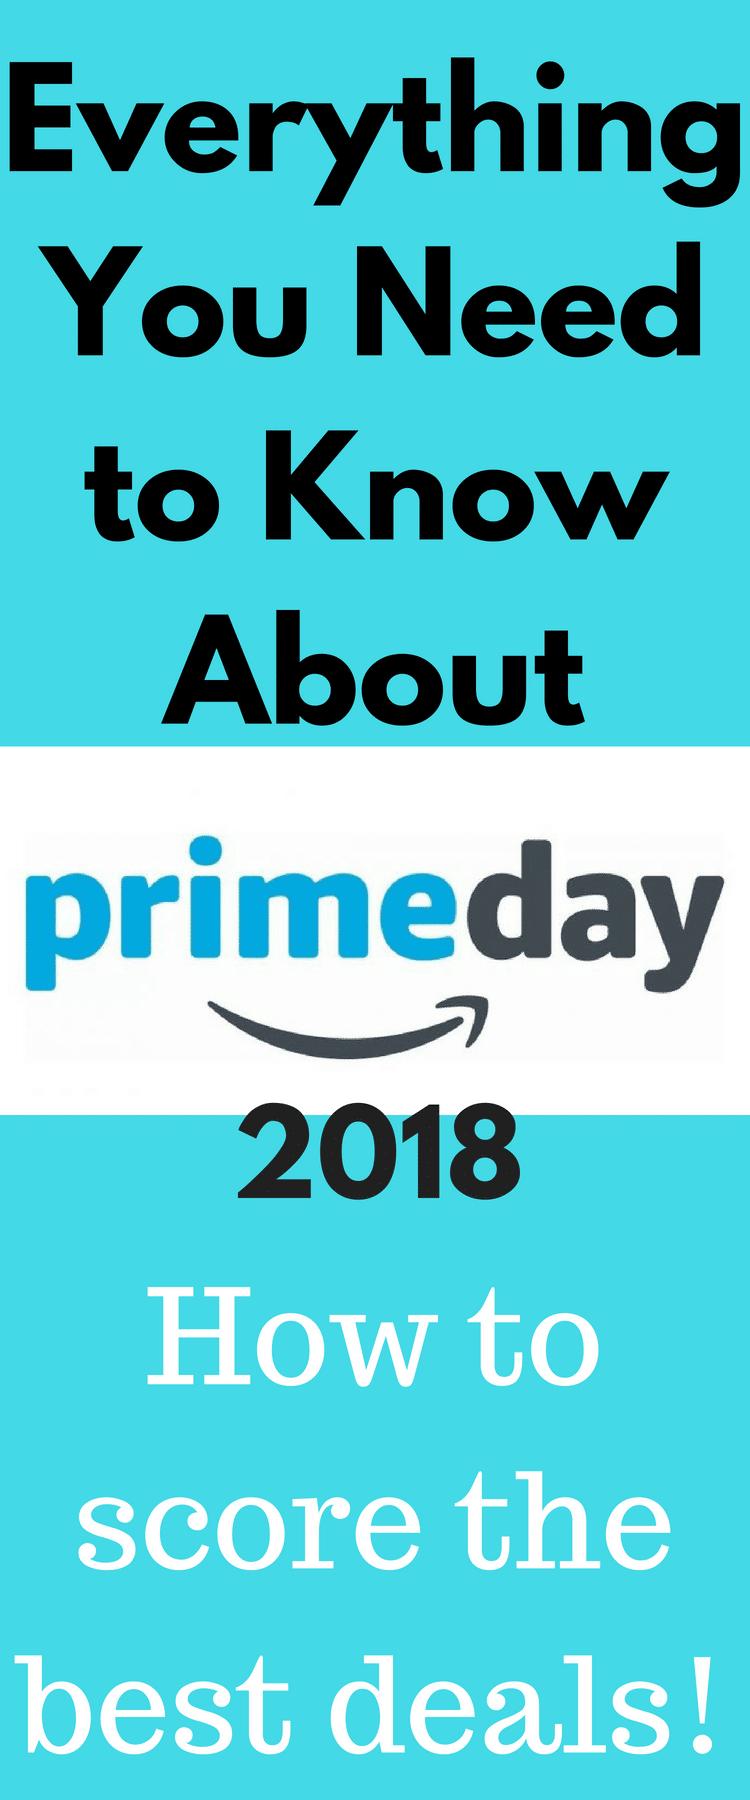 Amazon Prime Day 2017: What You Need to Know via @clarkscondensed